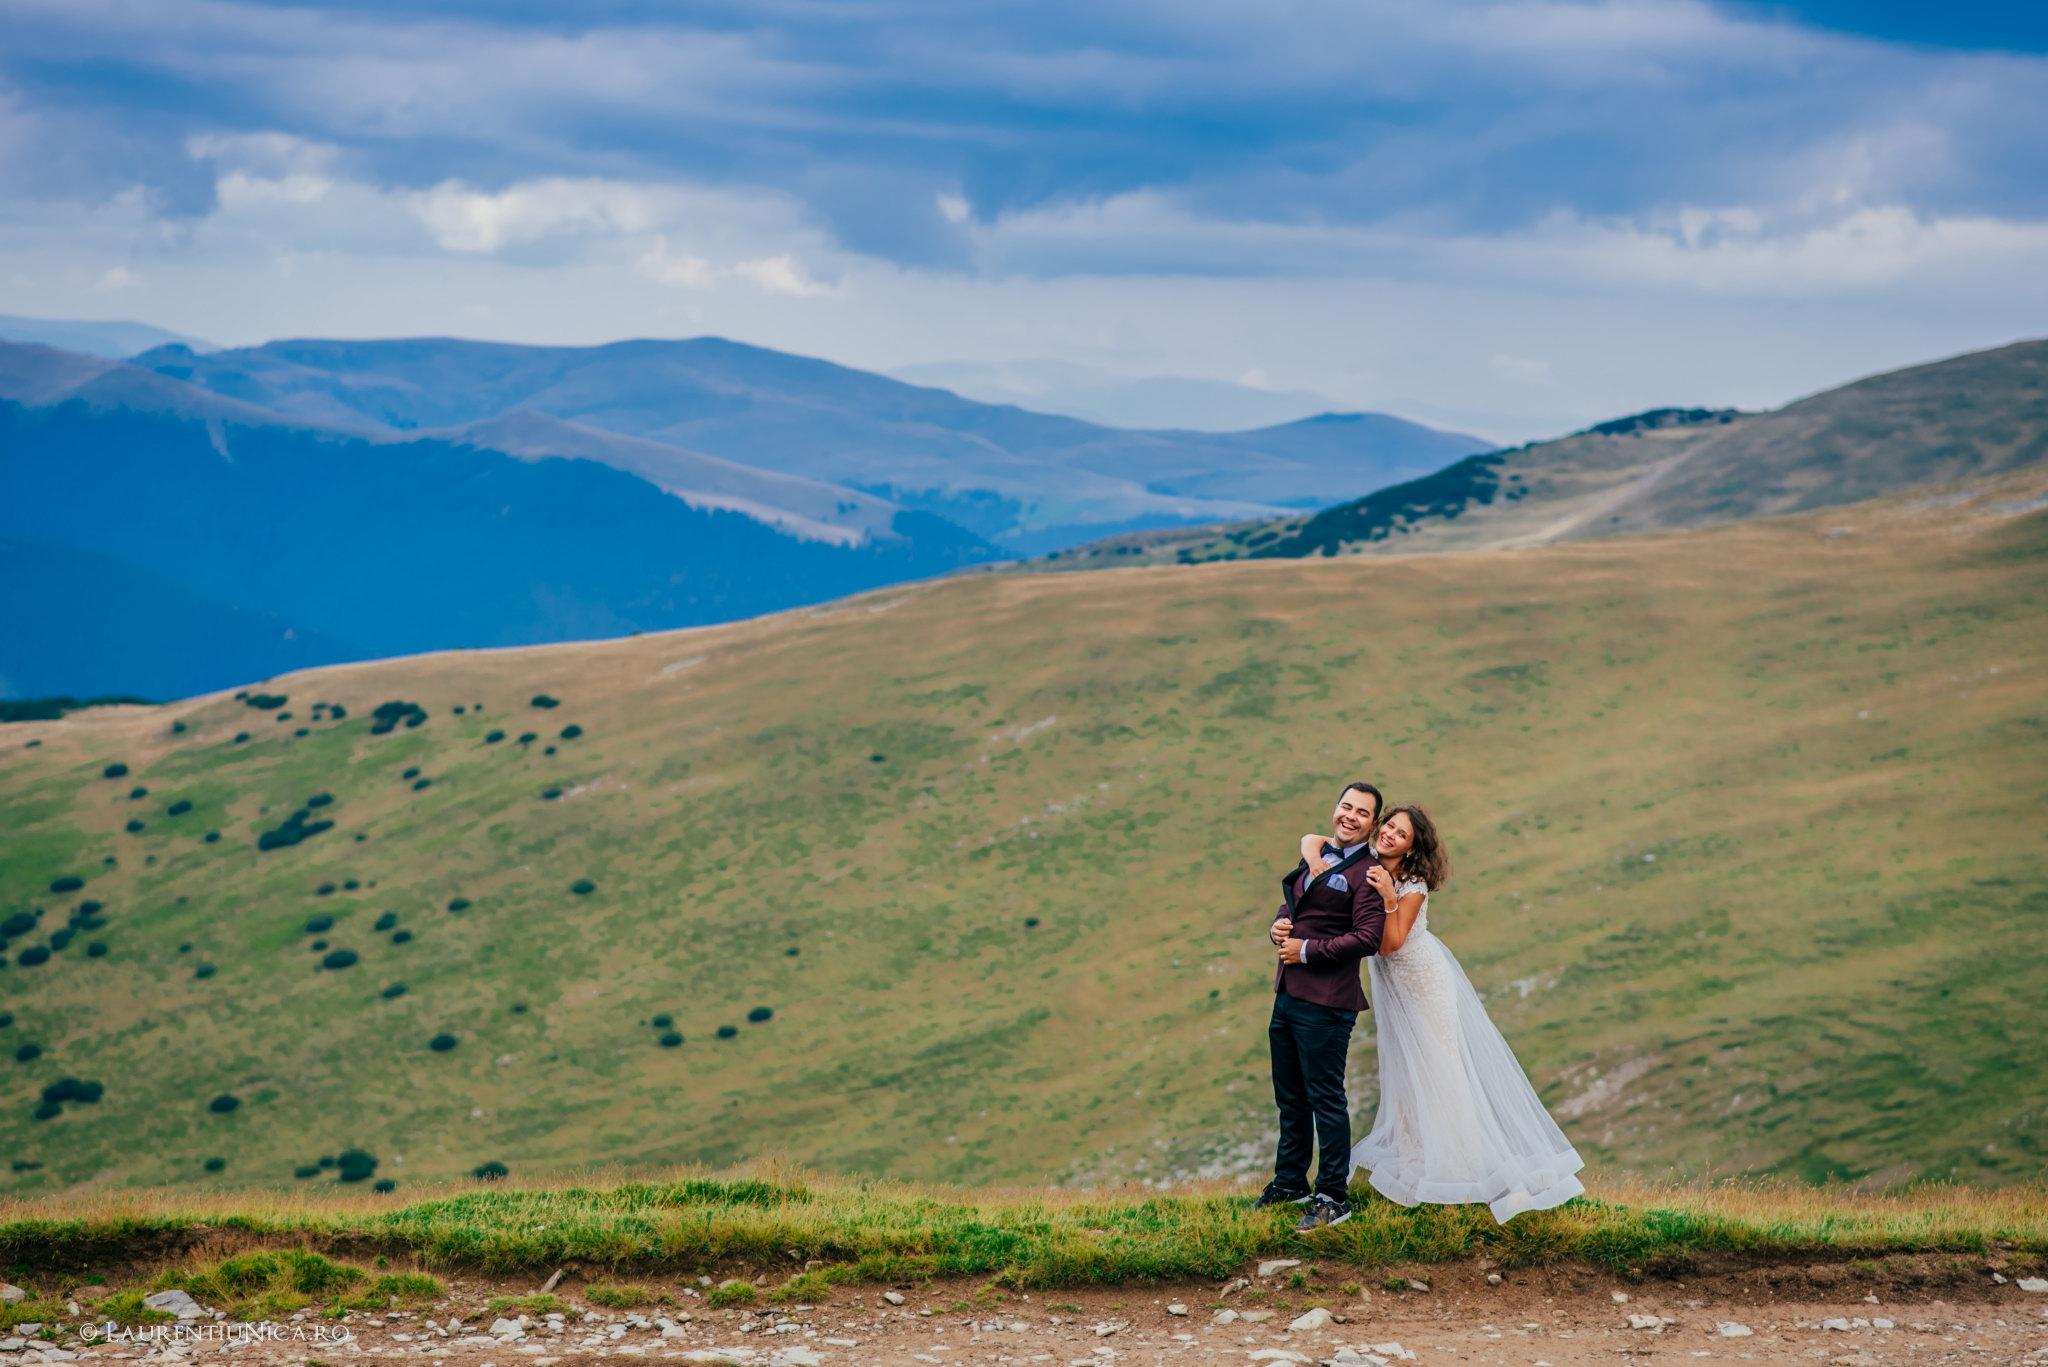 , Denisa & Catalin | Fotografii After Wedding | Muntii Parang